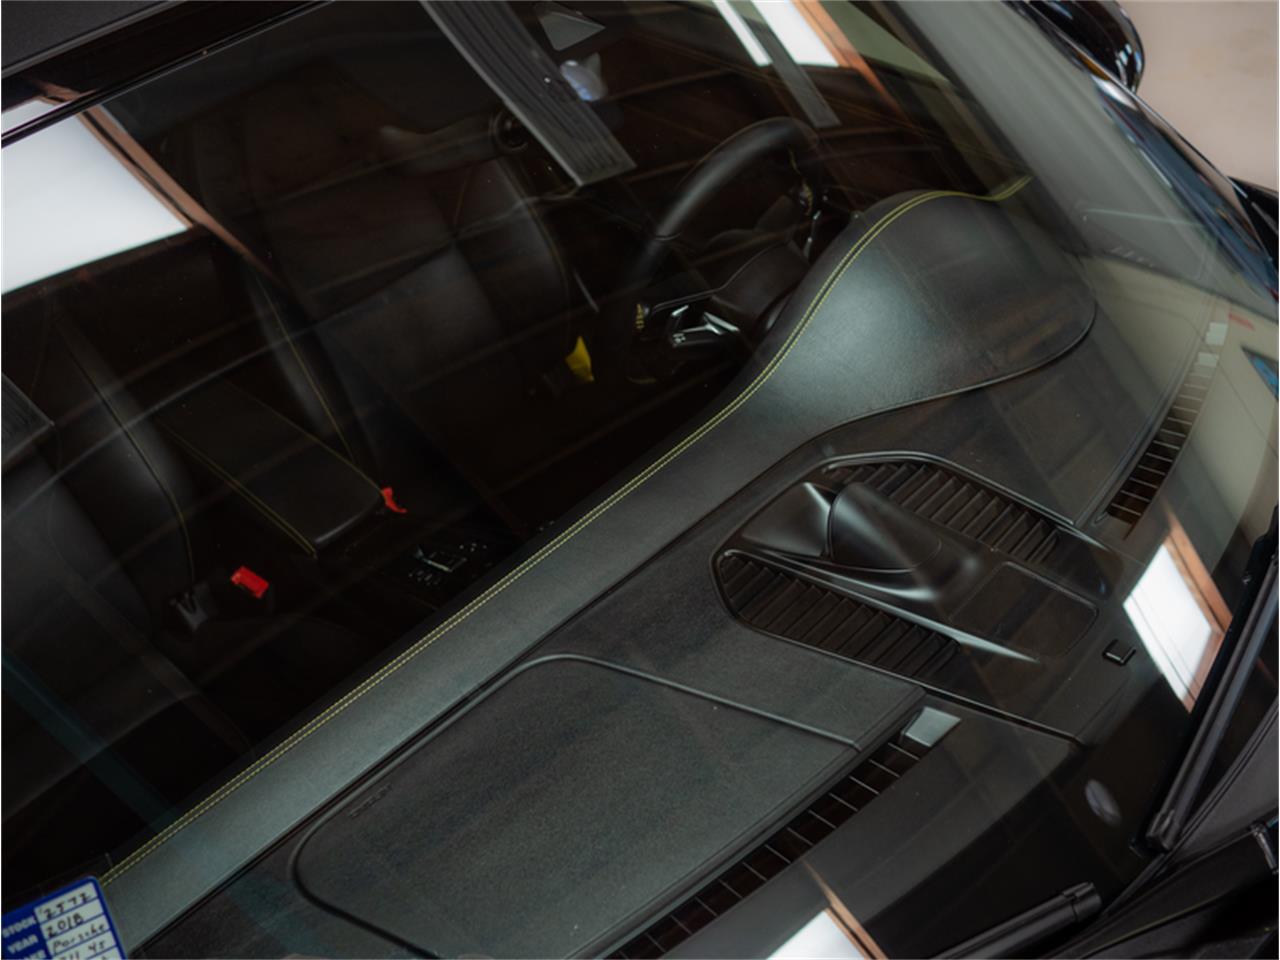 2018 Porsche 911 (CC-1410210) for sale in Fallbrook, California